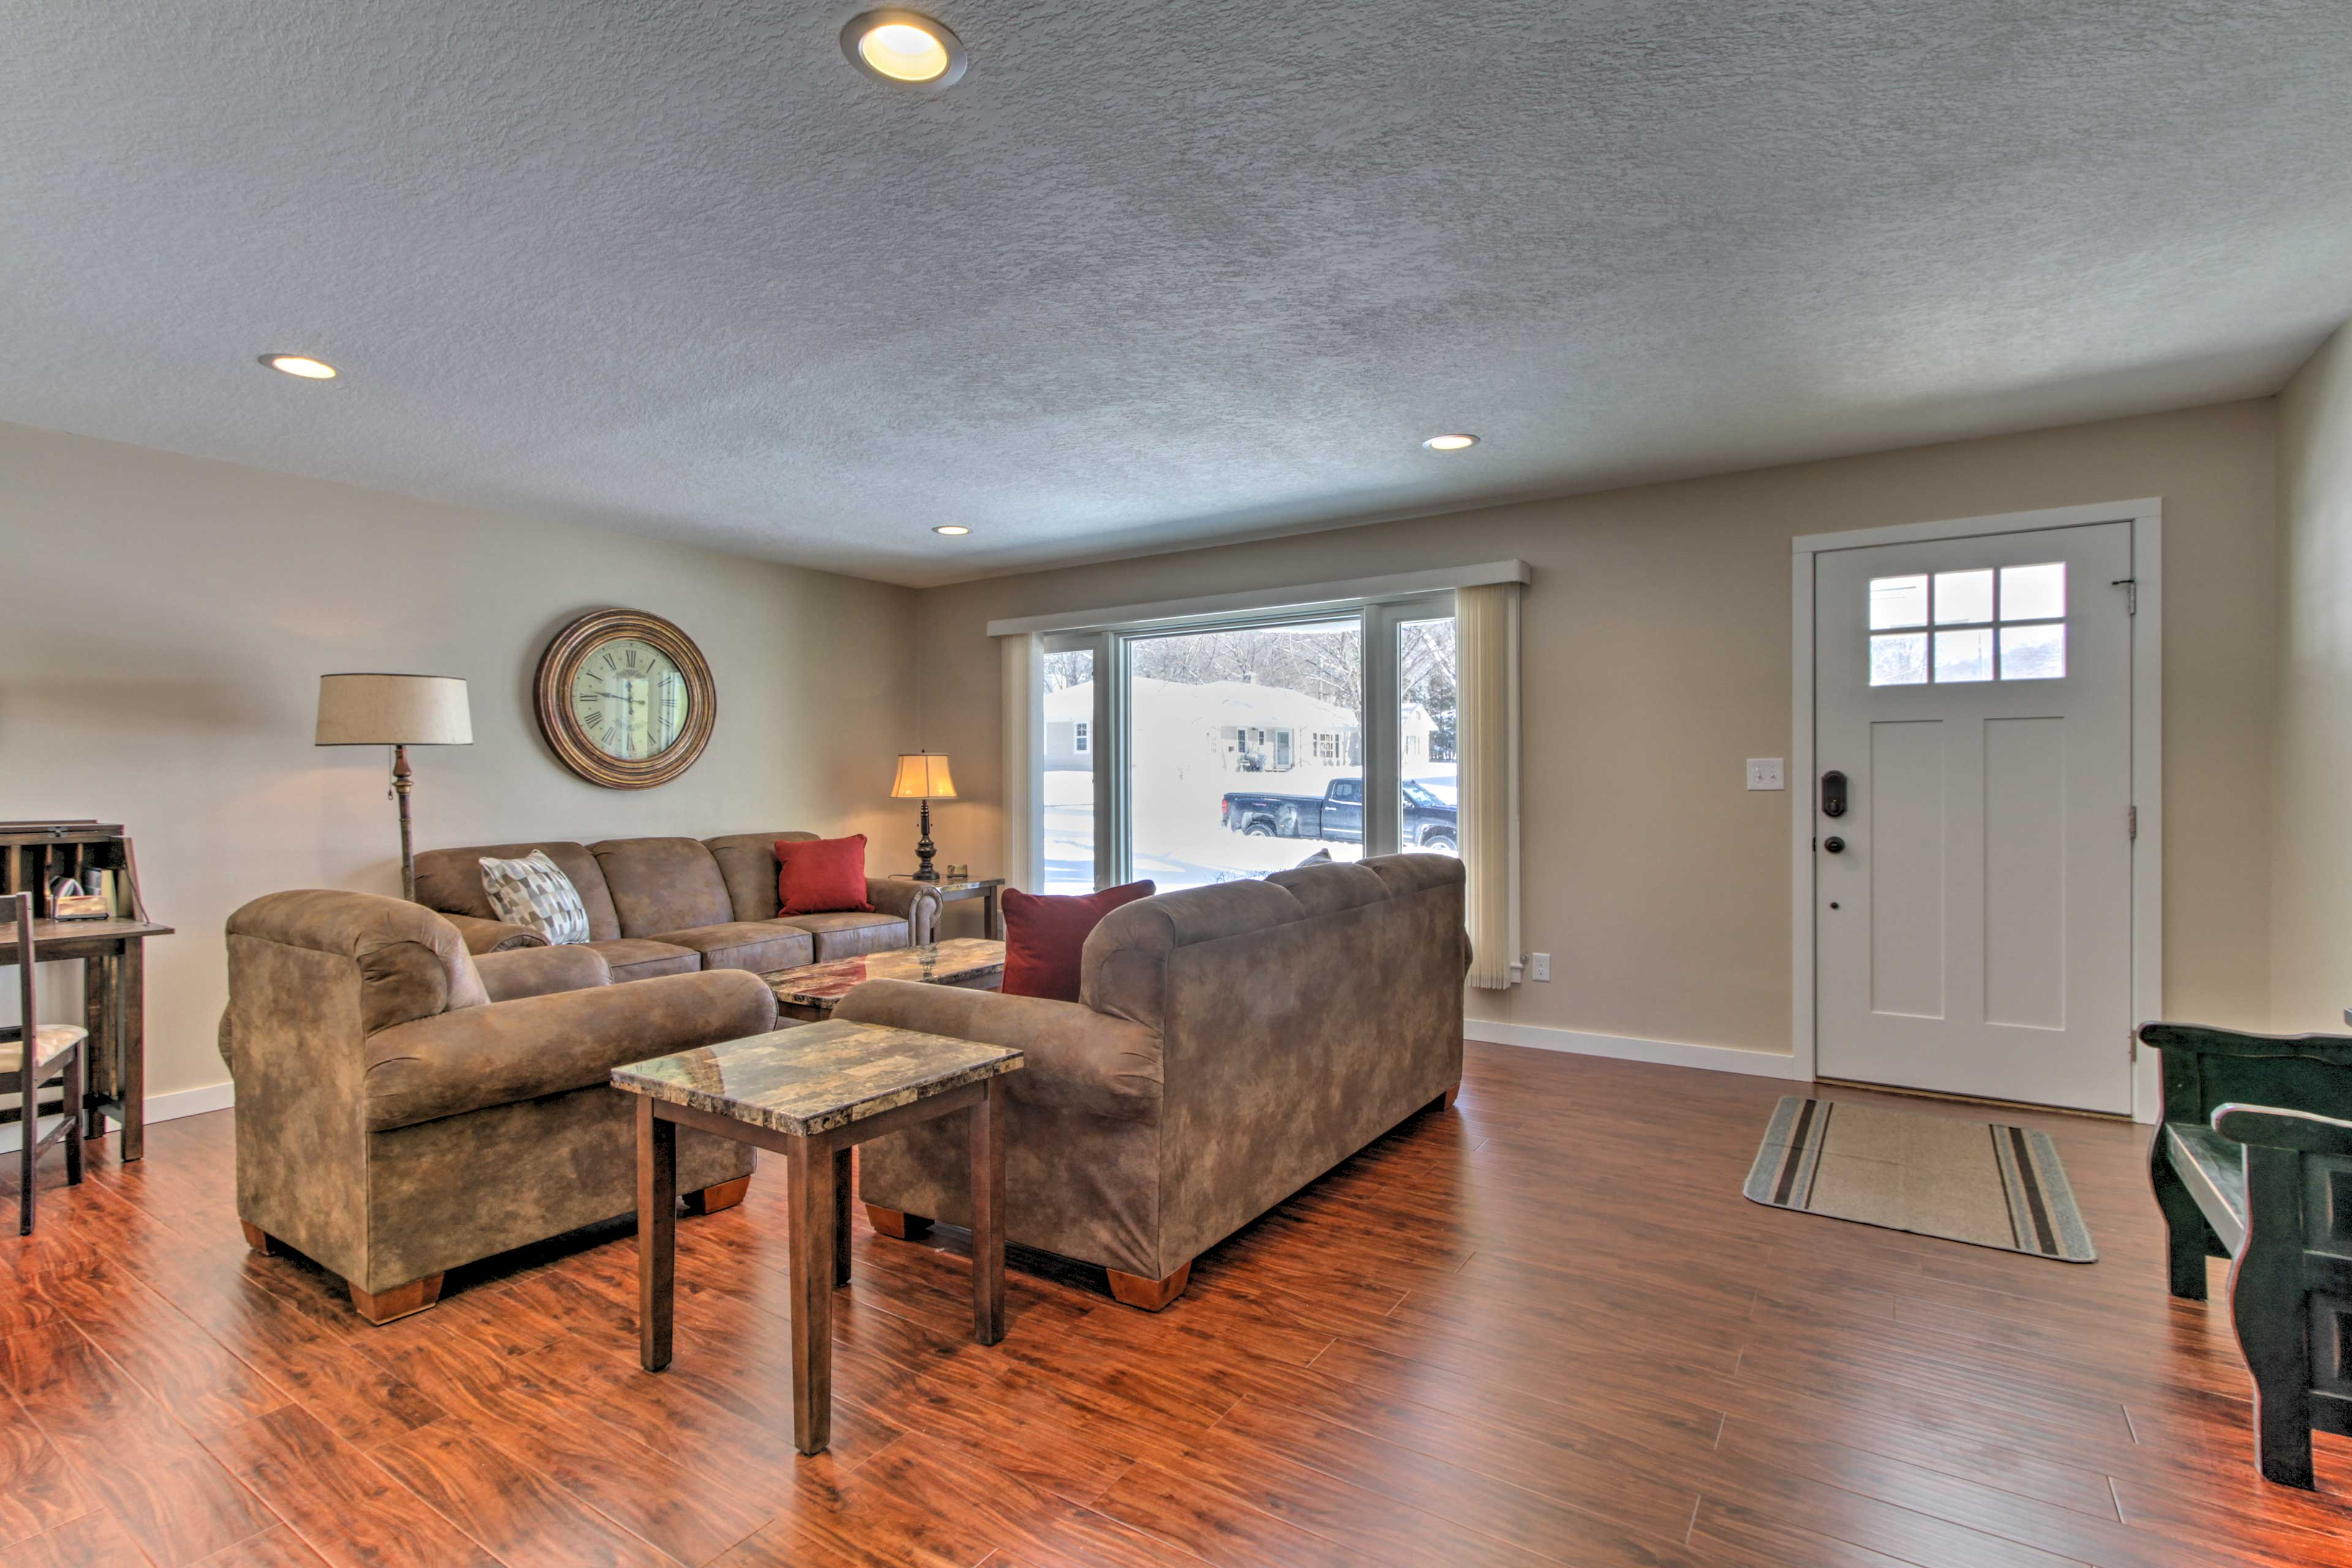 A plush furniture set fills the family room.